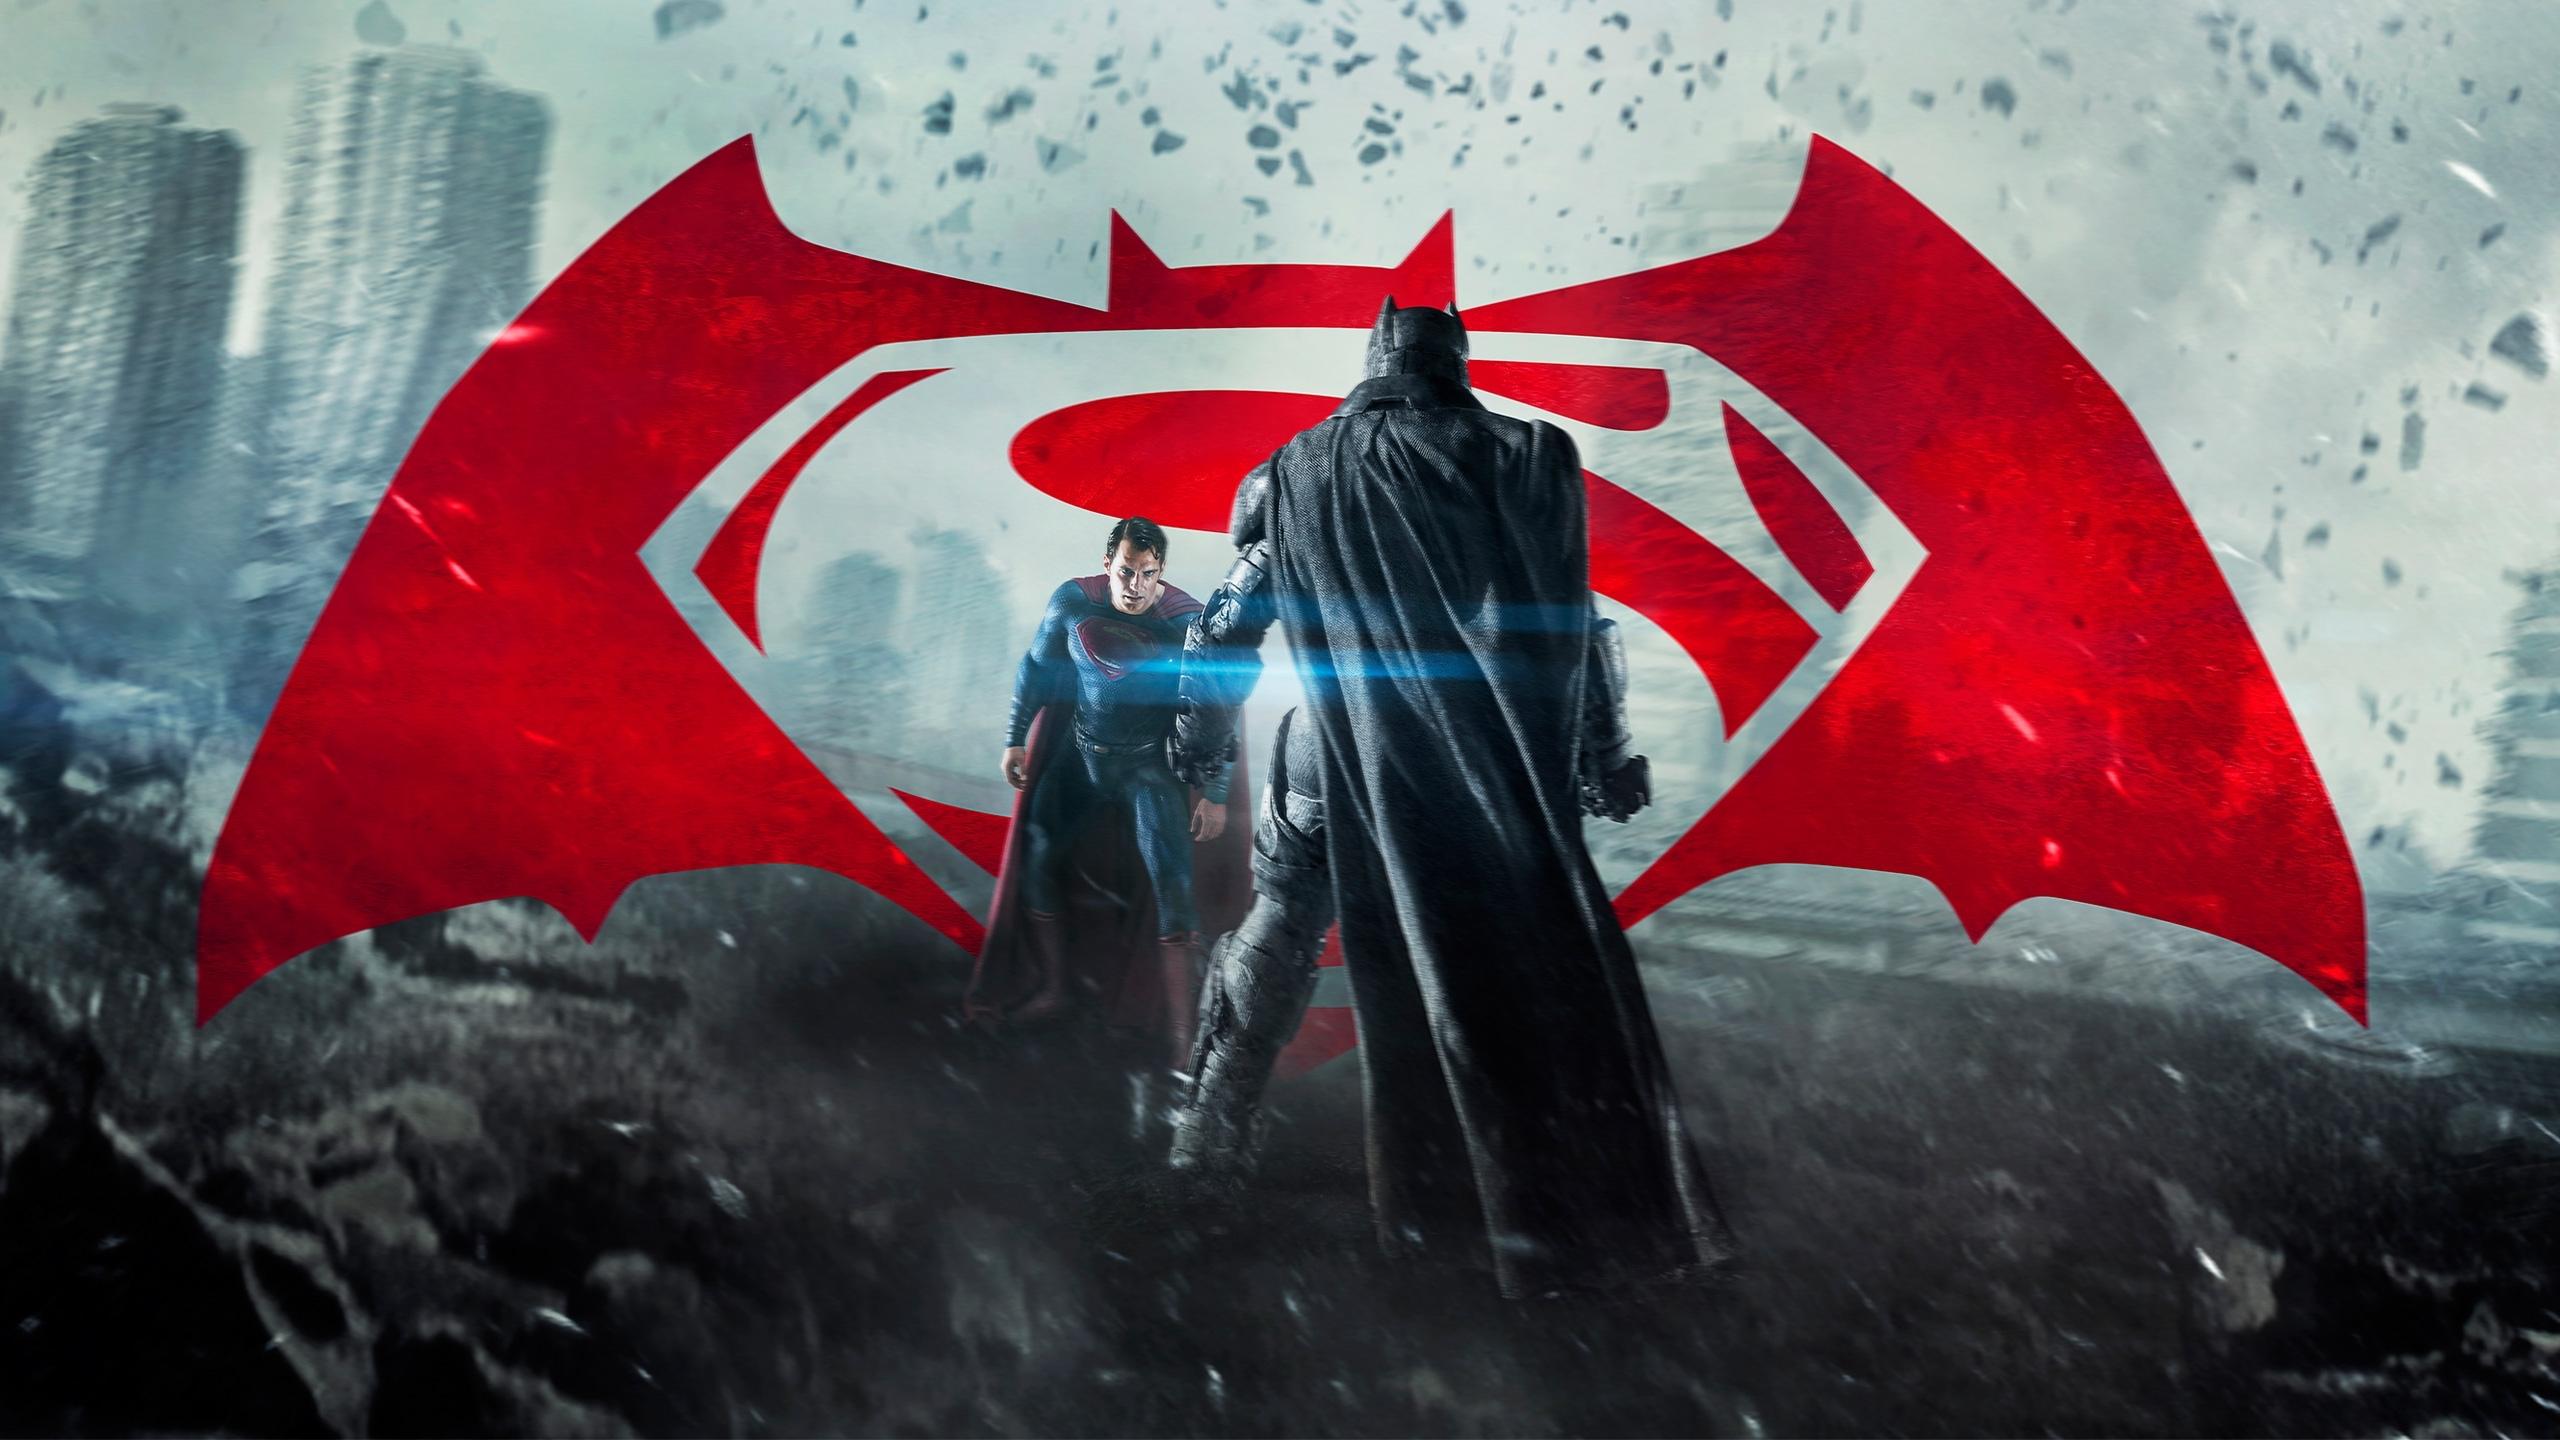 10 Best Batman V Superman Wallpaper FULL HD 1080p For PC Desktop 2018 Free Download